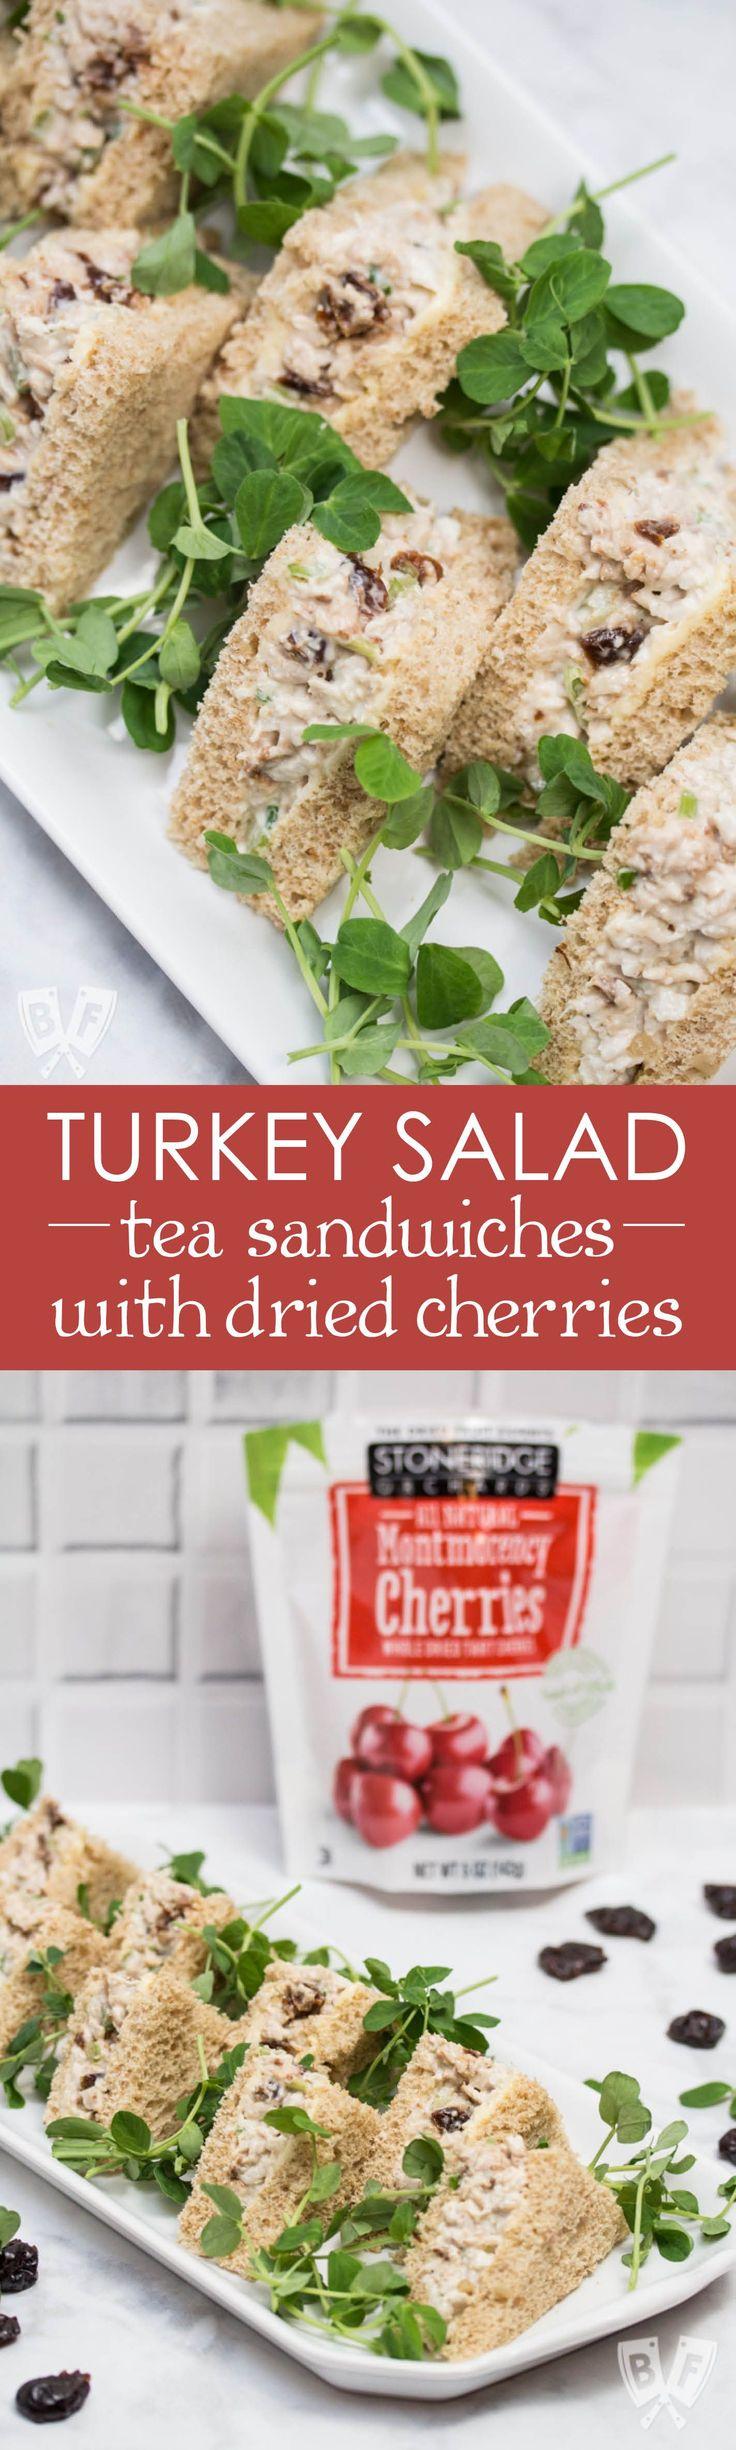 Best 25 tea sandwiches ideas only on pinterest high tea for Club sandwich fillings for high tea